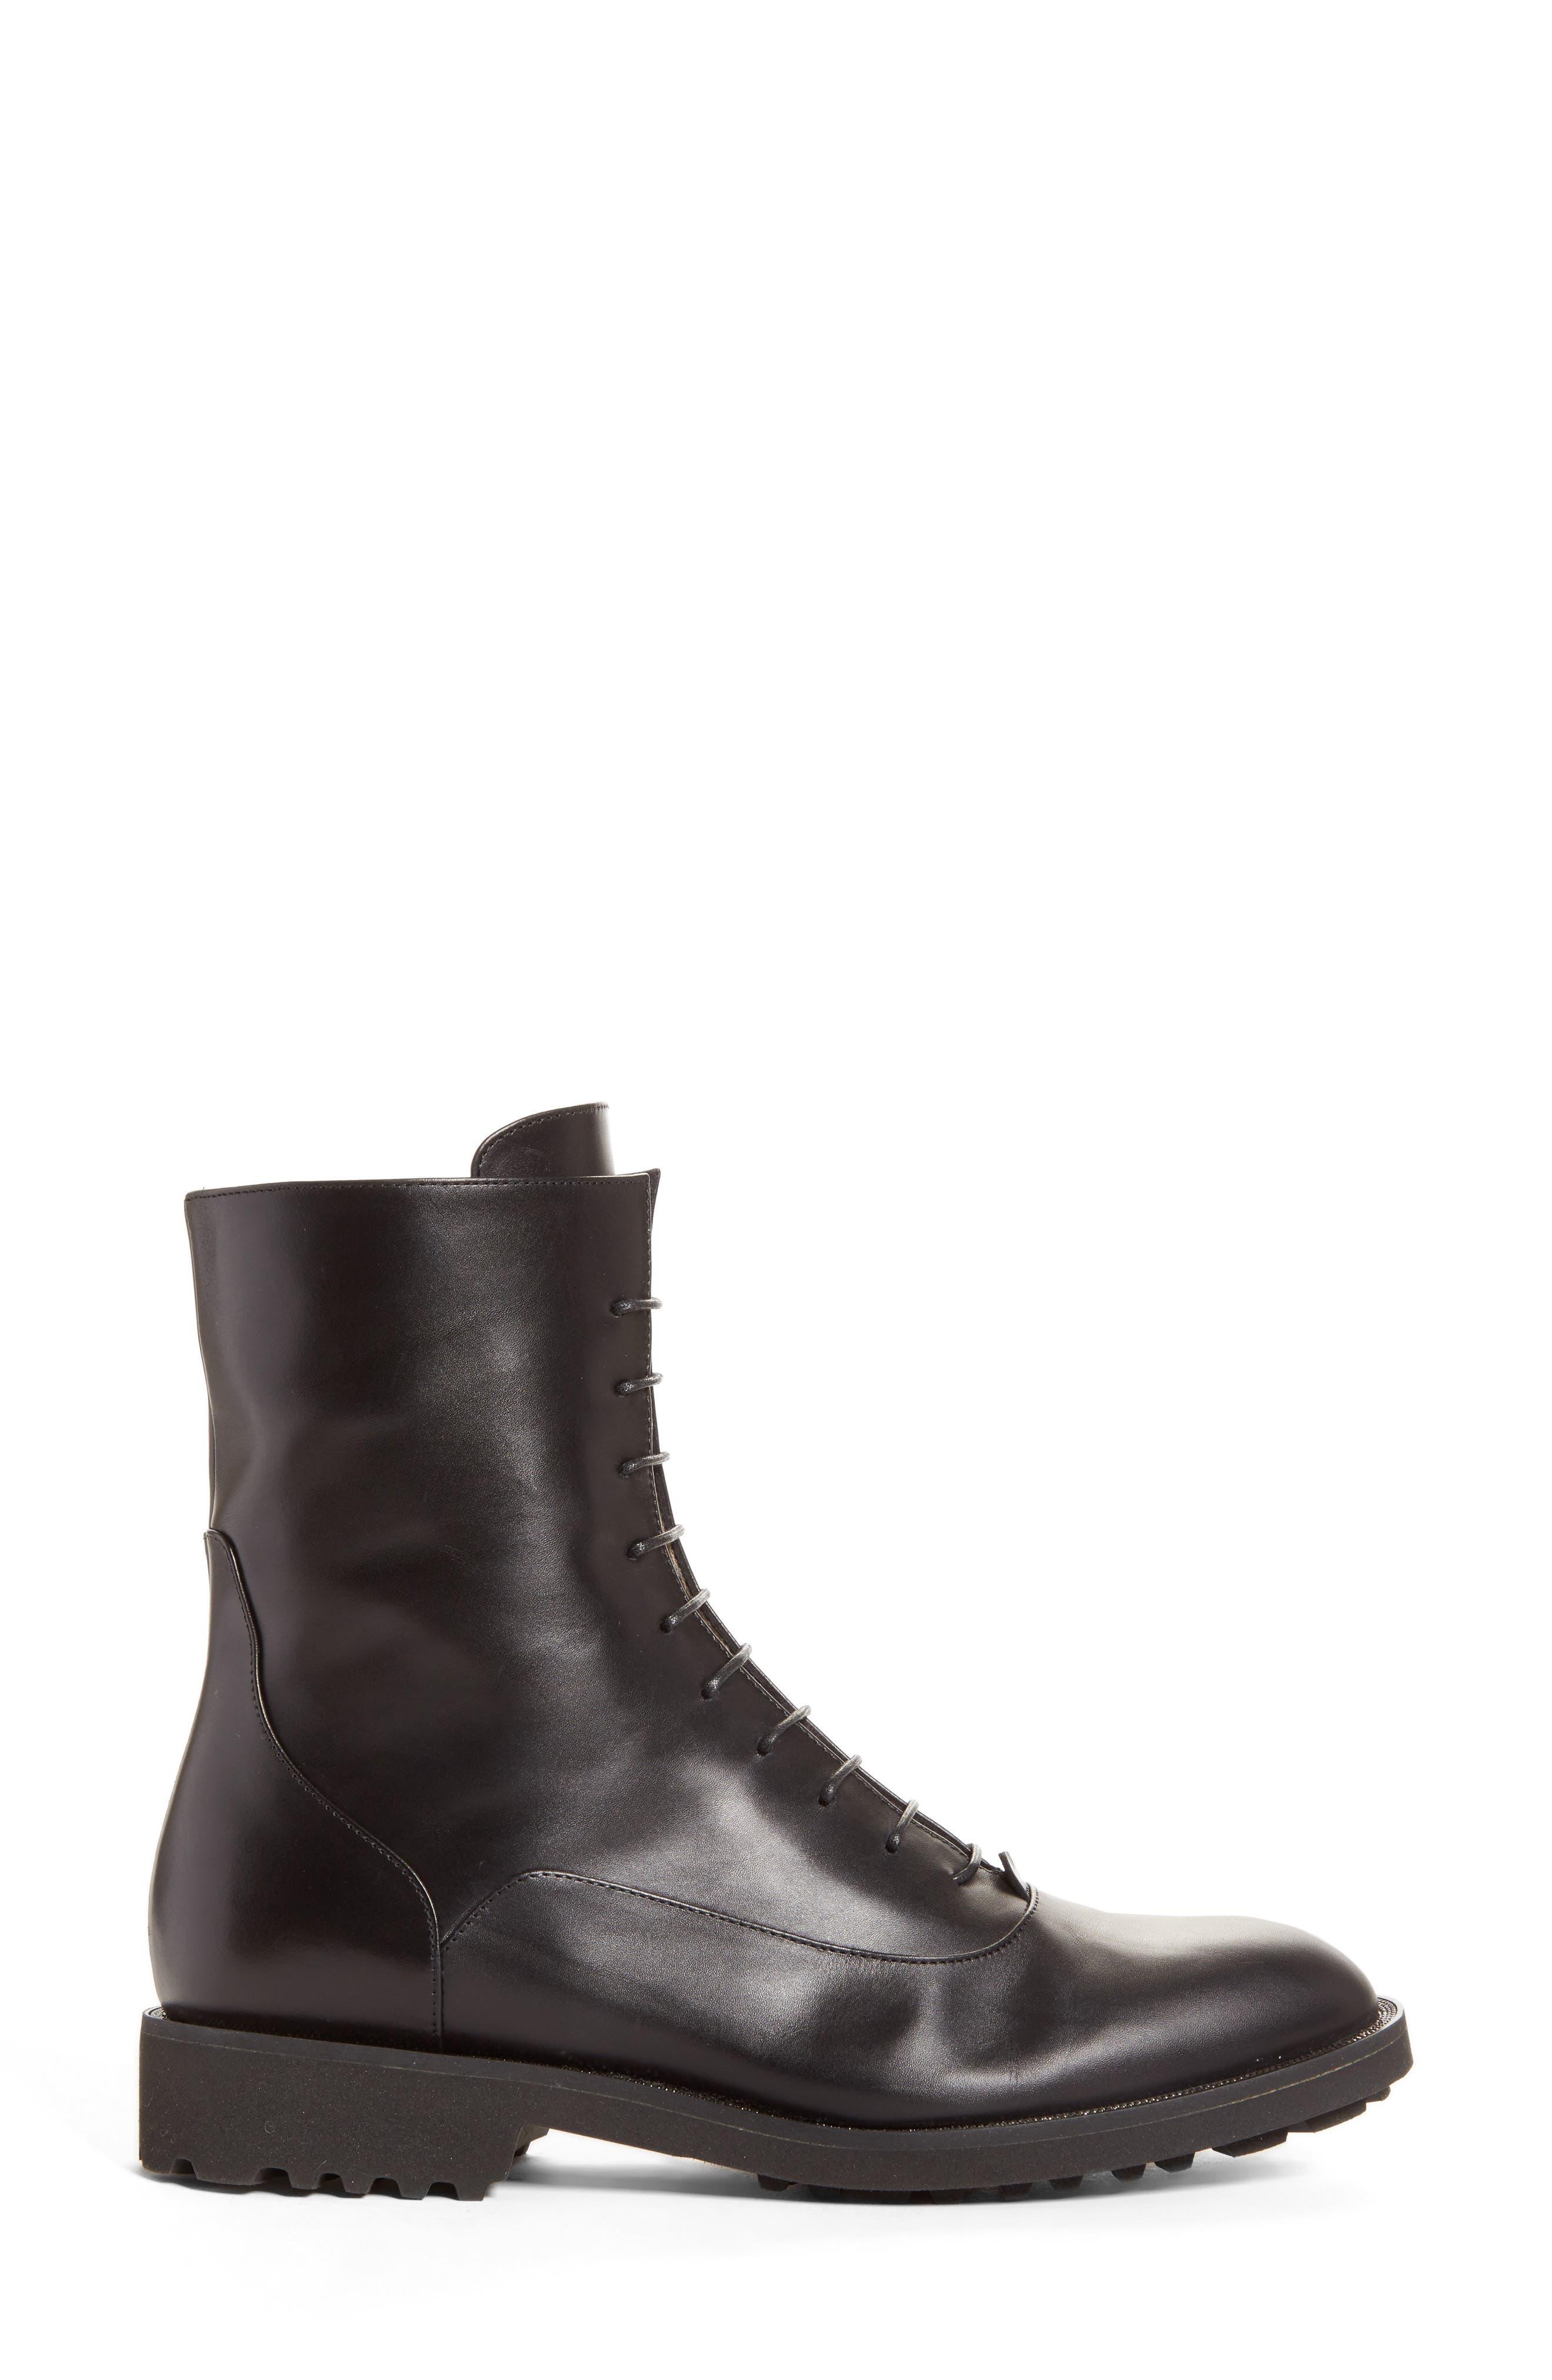 Ludovica Combat Boot,                             Alternate thumbnail 2, color,                             Black